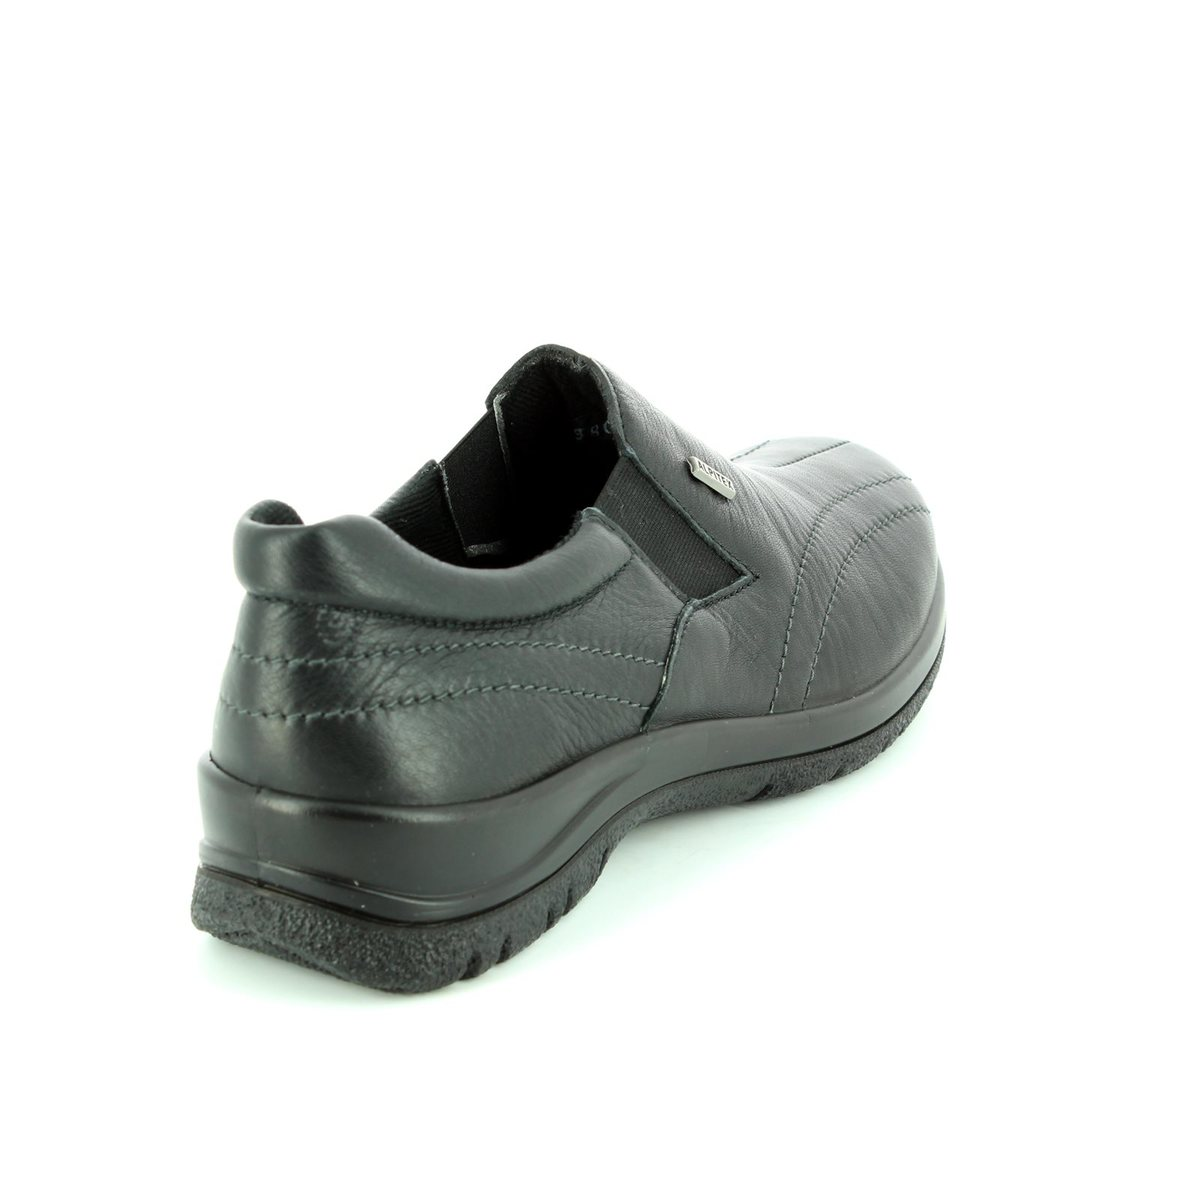 Alpina Shoes Price